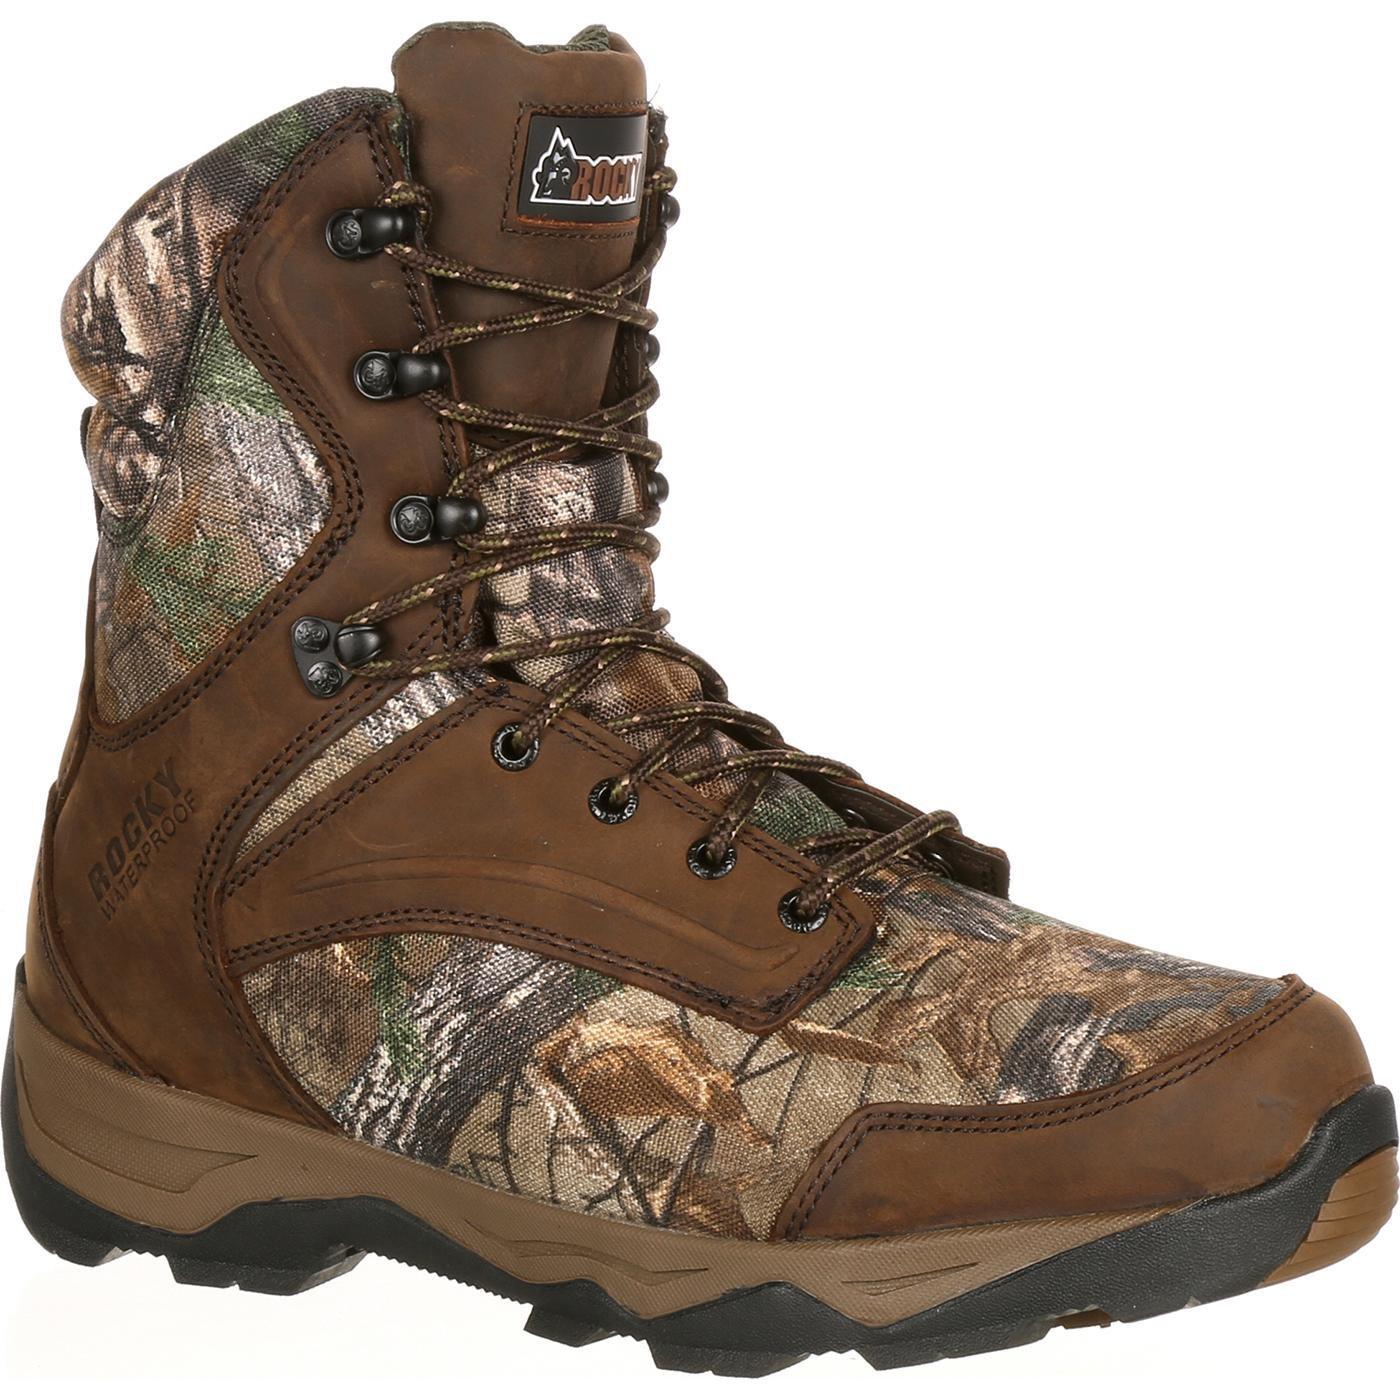 Rocky Men's RKS0227 Mid Calf Boot Realtree Xtra 8.5 M US